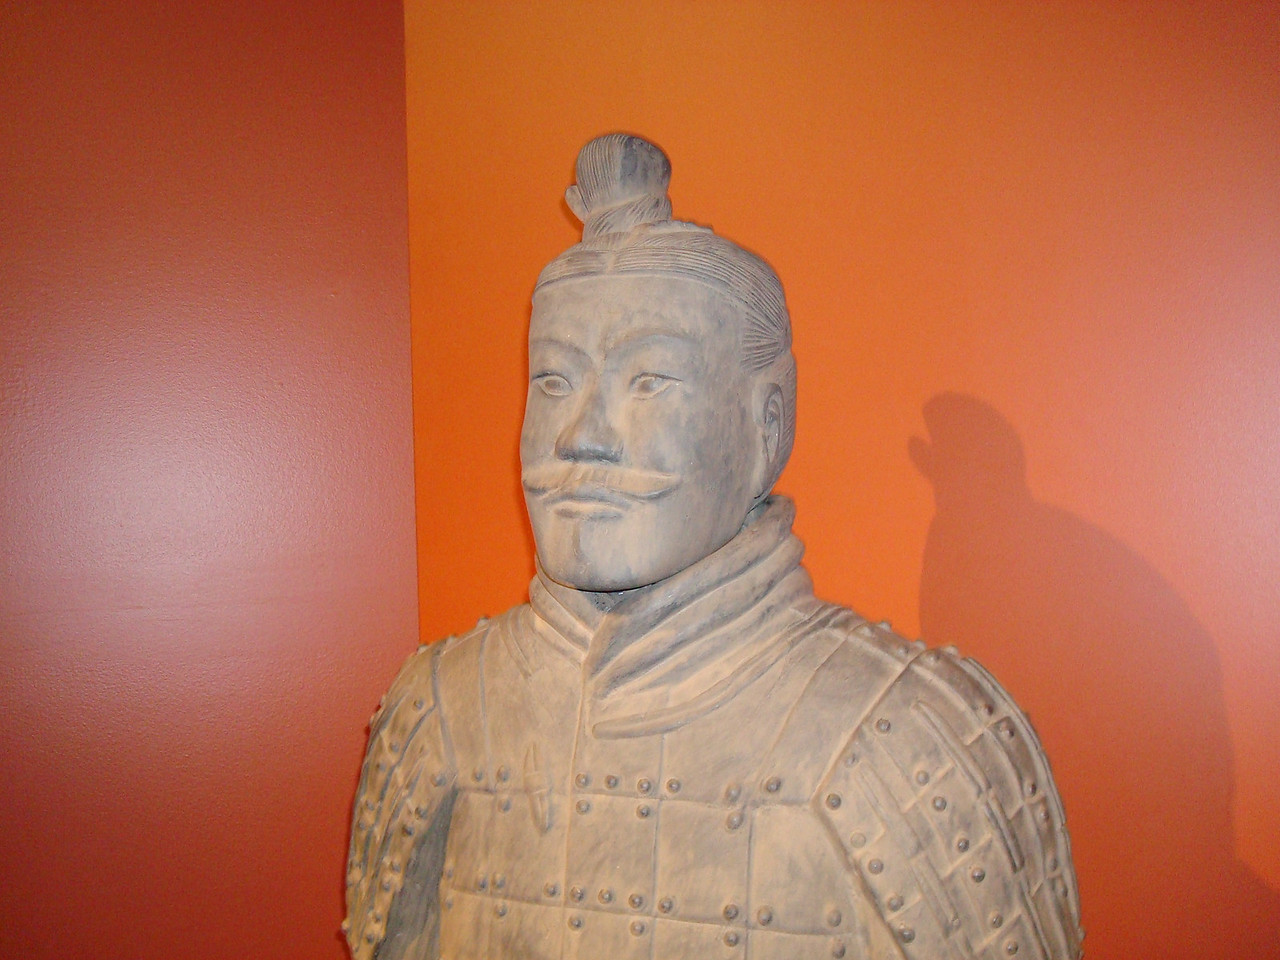 National Geographic Museum - Terra Cotta Warriors exhibit